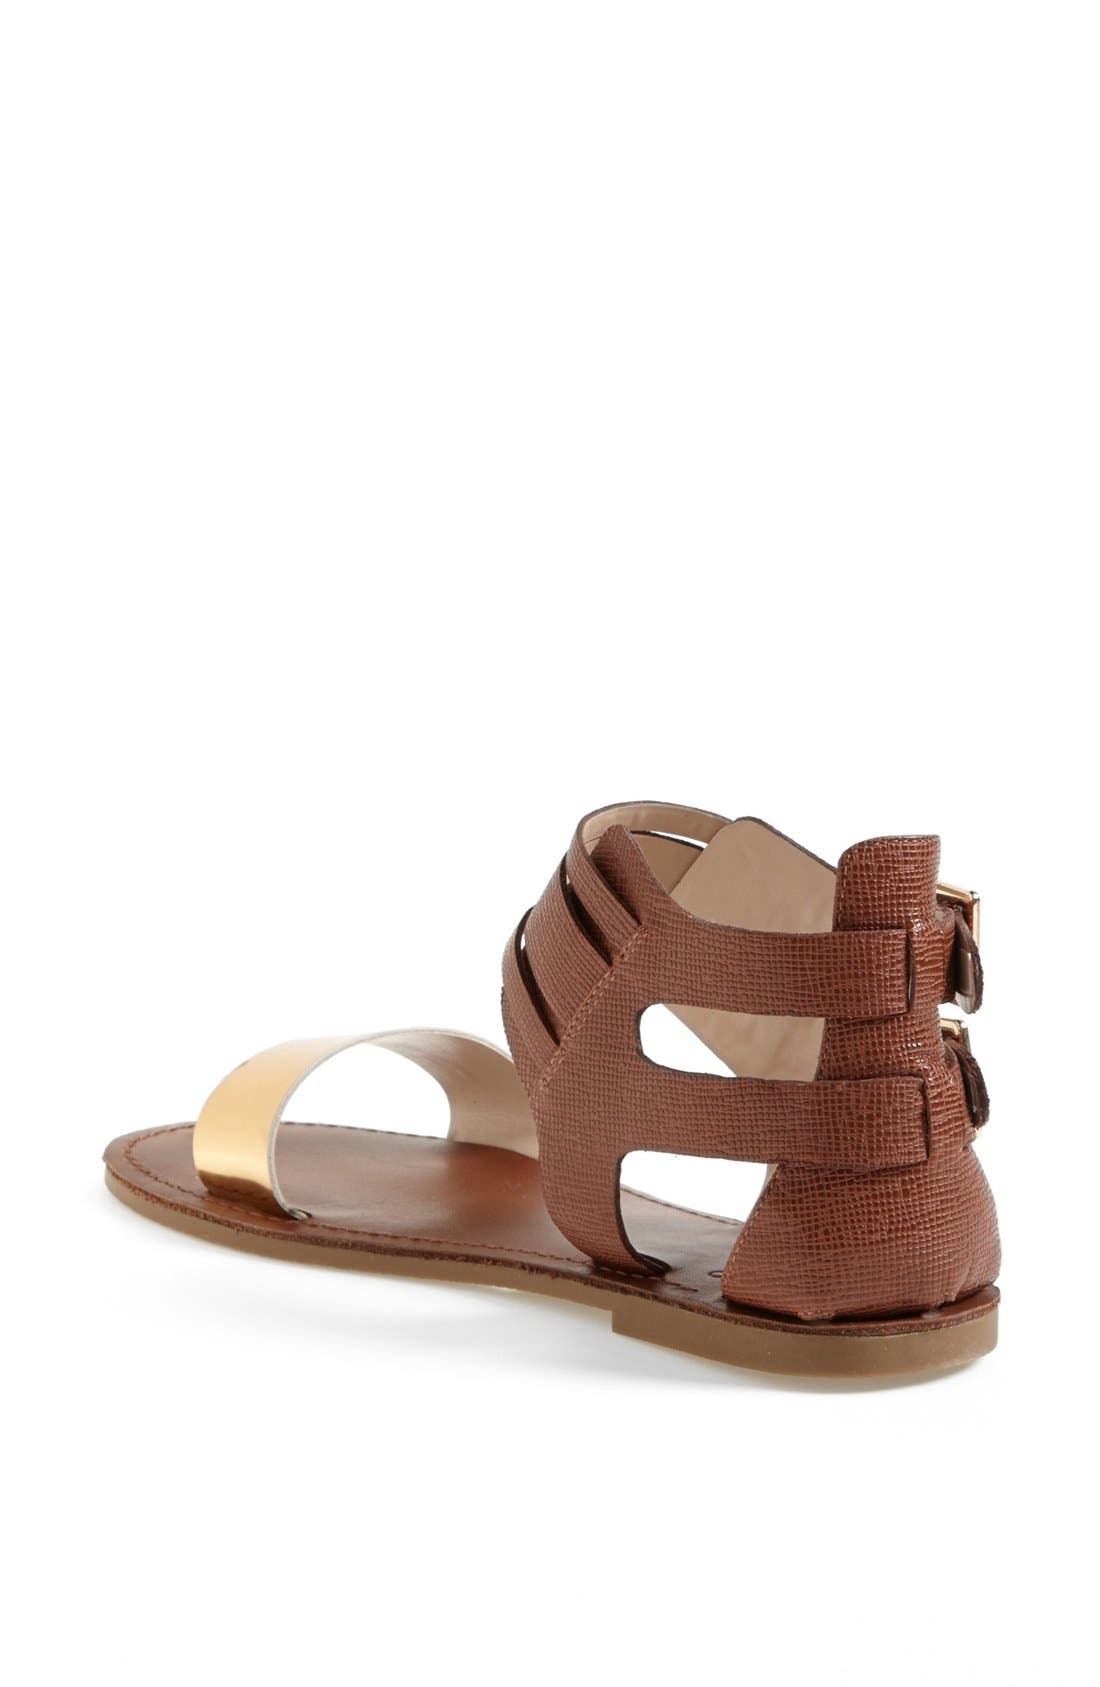 Alternate Image 2  - Vince Camuto 'Irkeno' Leather Sandal